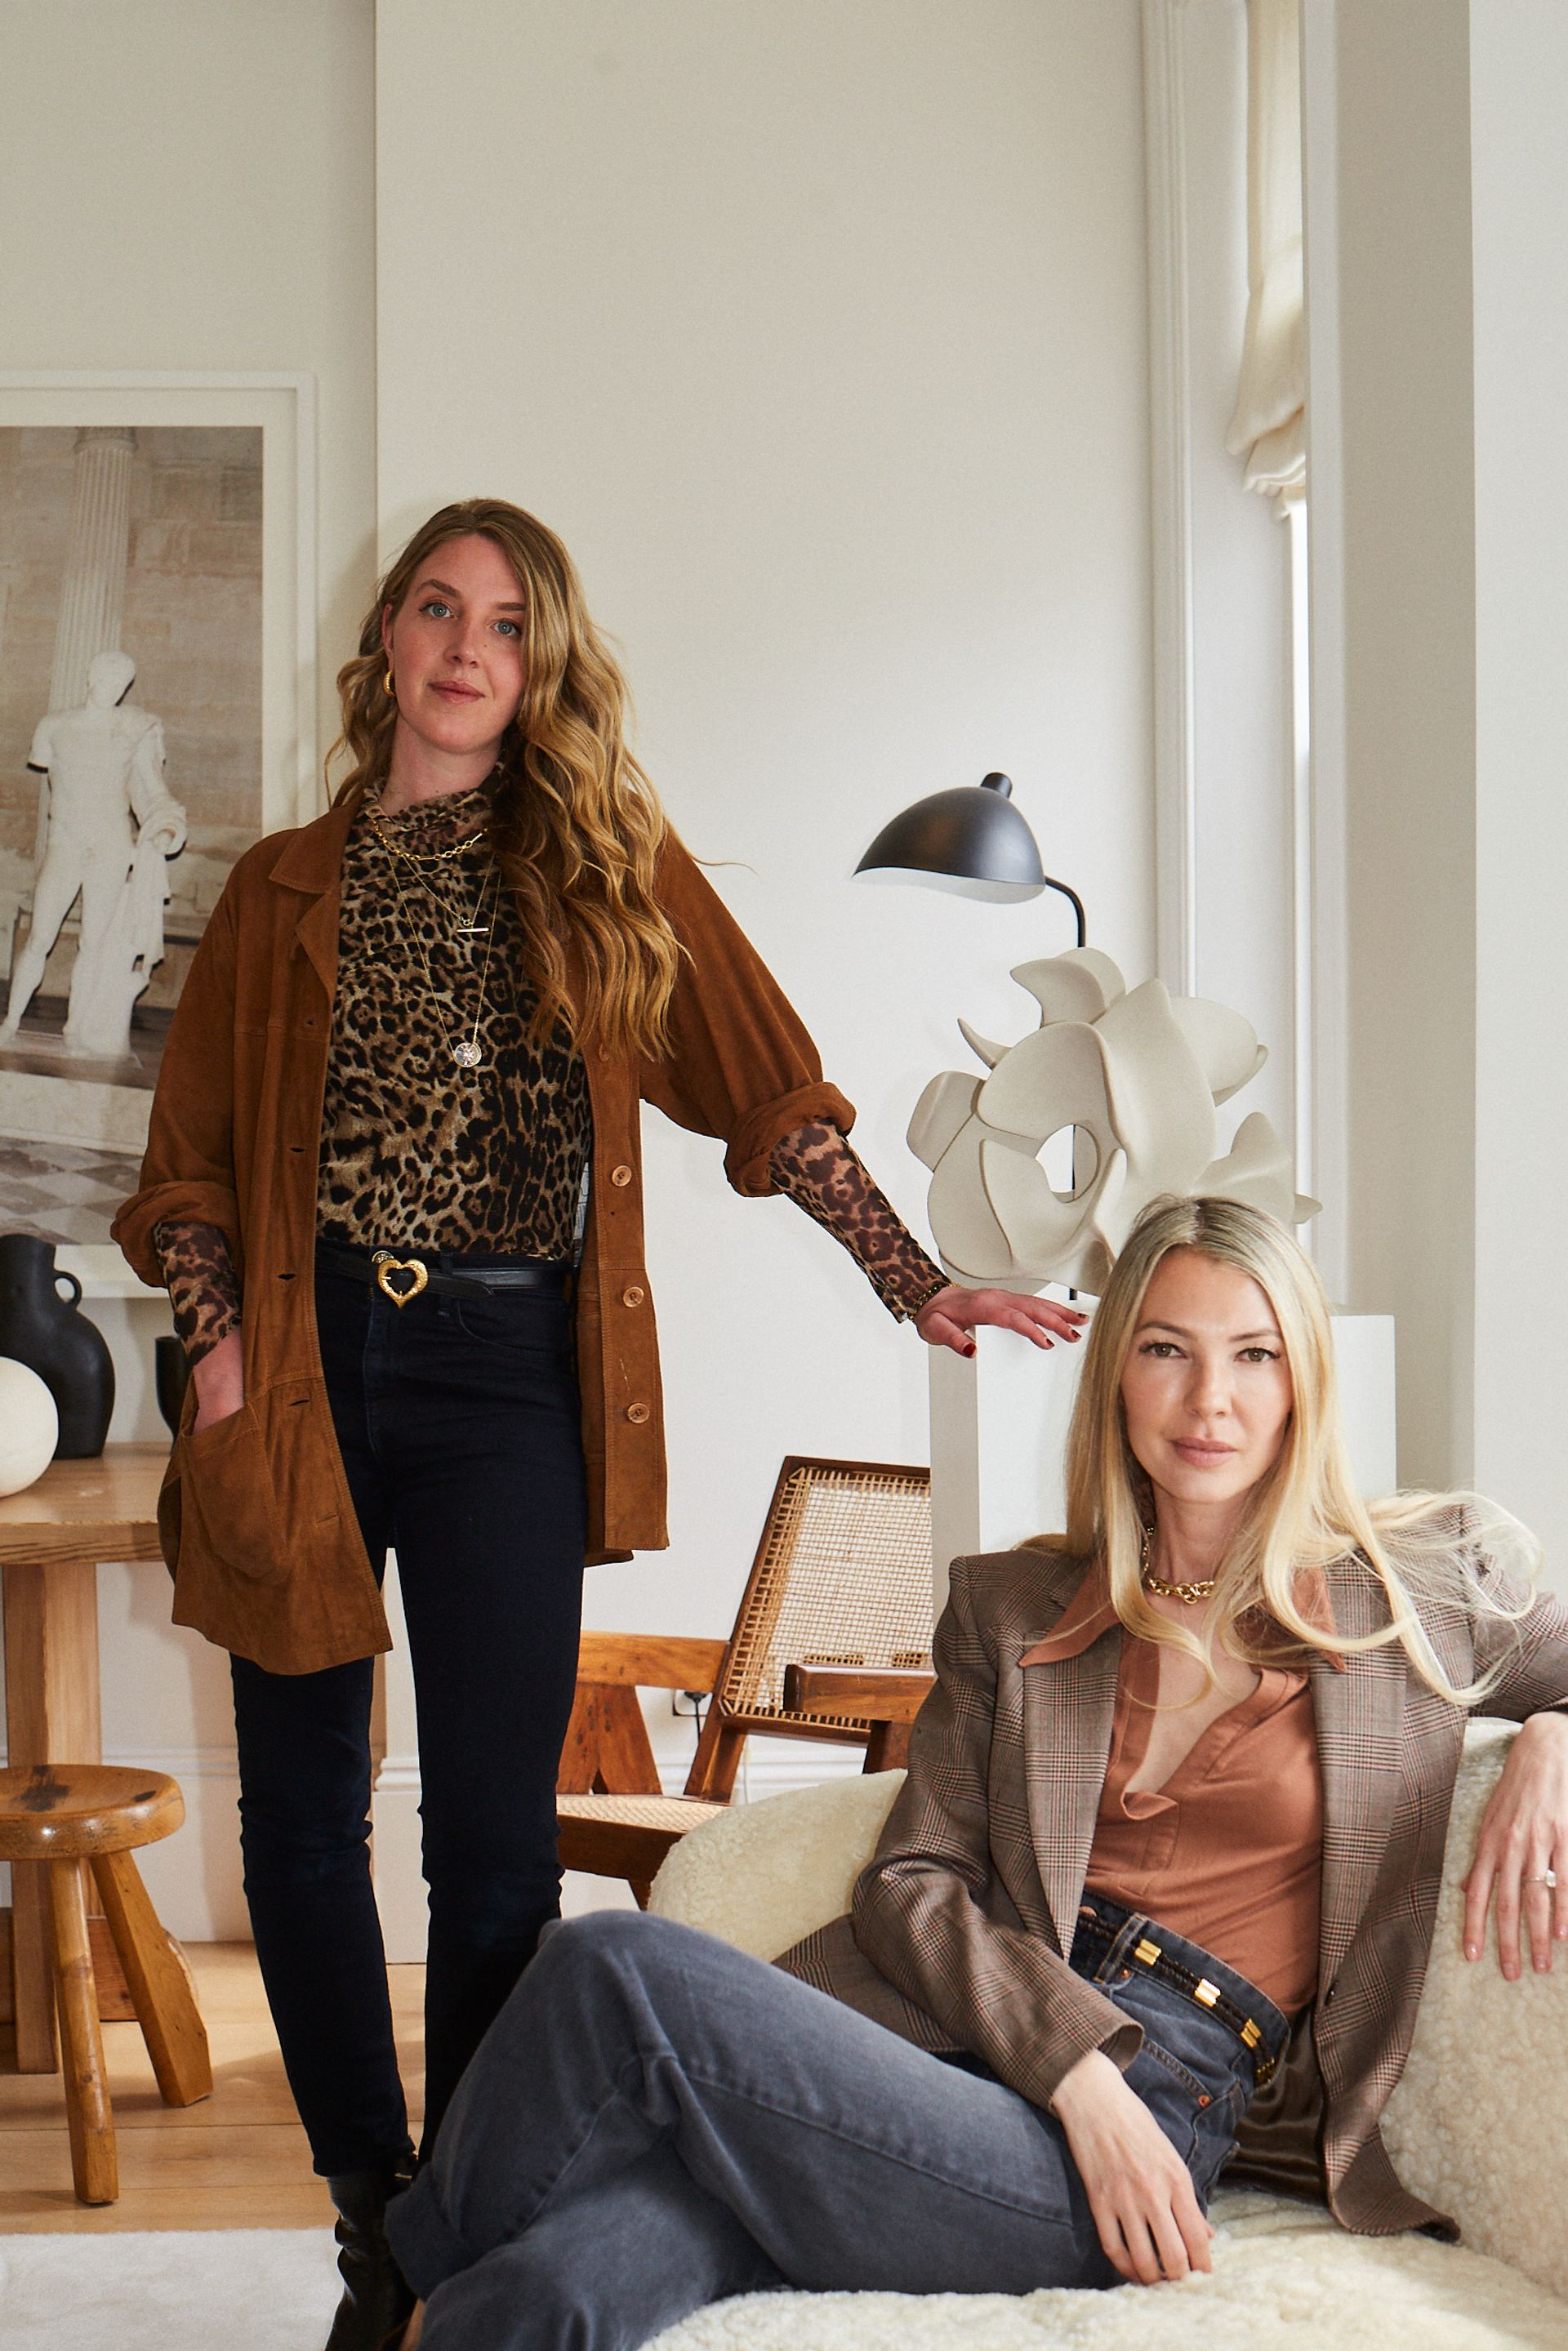 Lucinda Bellm and Roberta Benteler Courtesy LAMB Arts gallery. Photo by Billal Altright